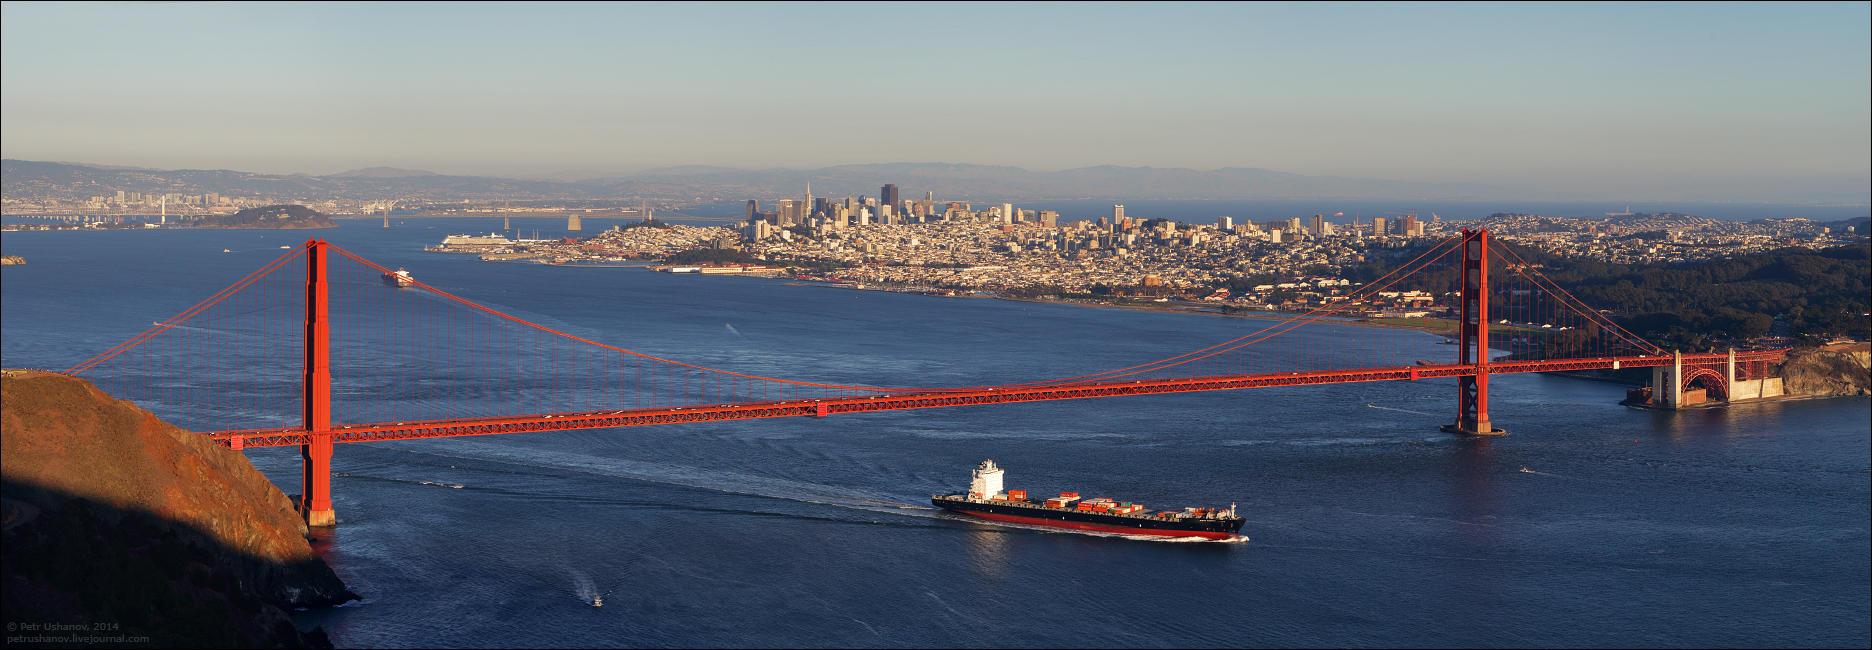 SFpanorama01 Сан Франциско   панорамы города